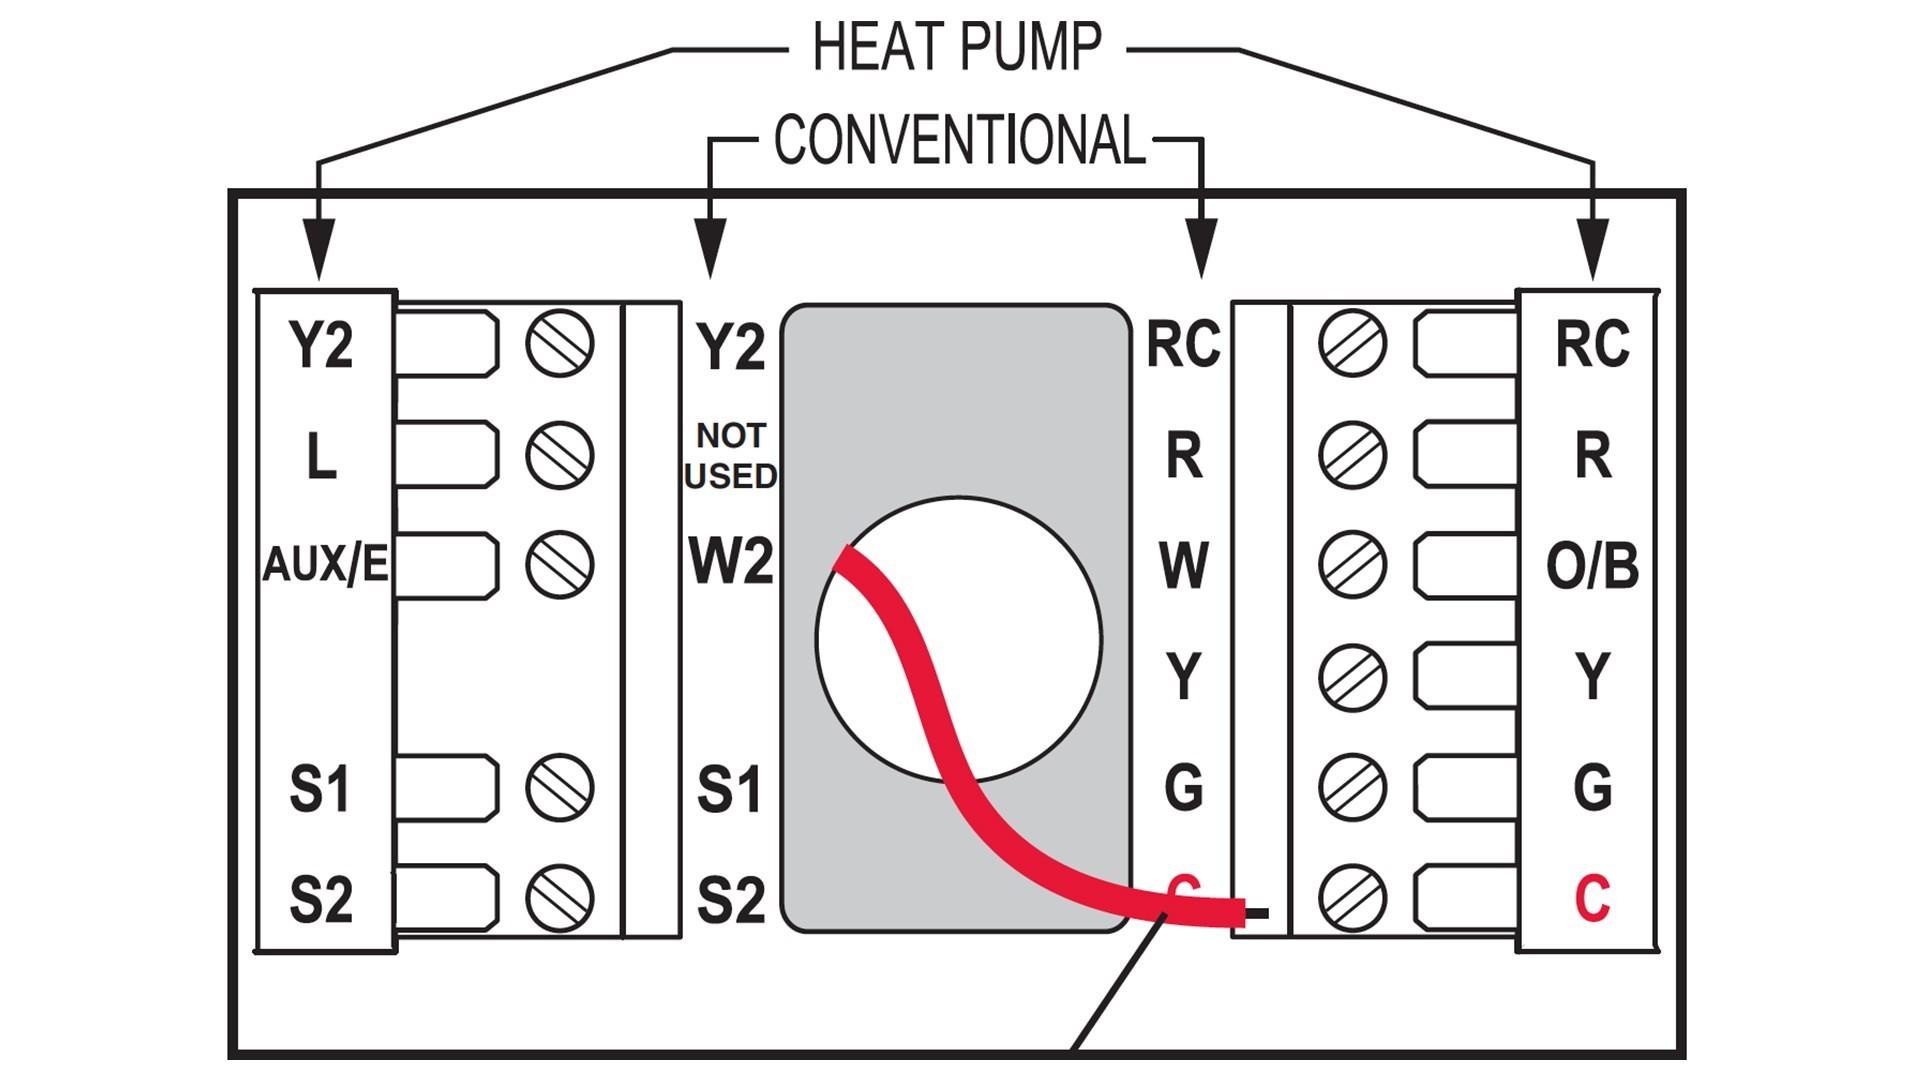 goodman heat pump package unit wiring diagram 220v plug thermostat